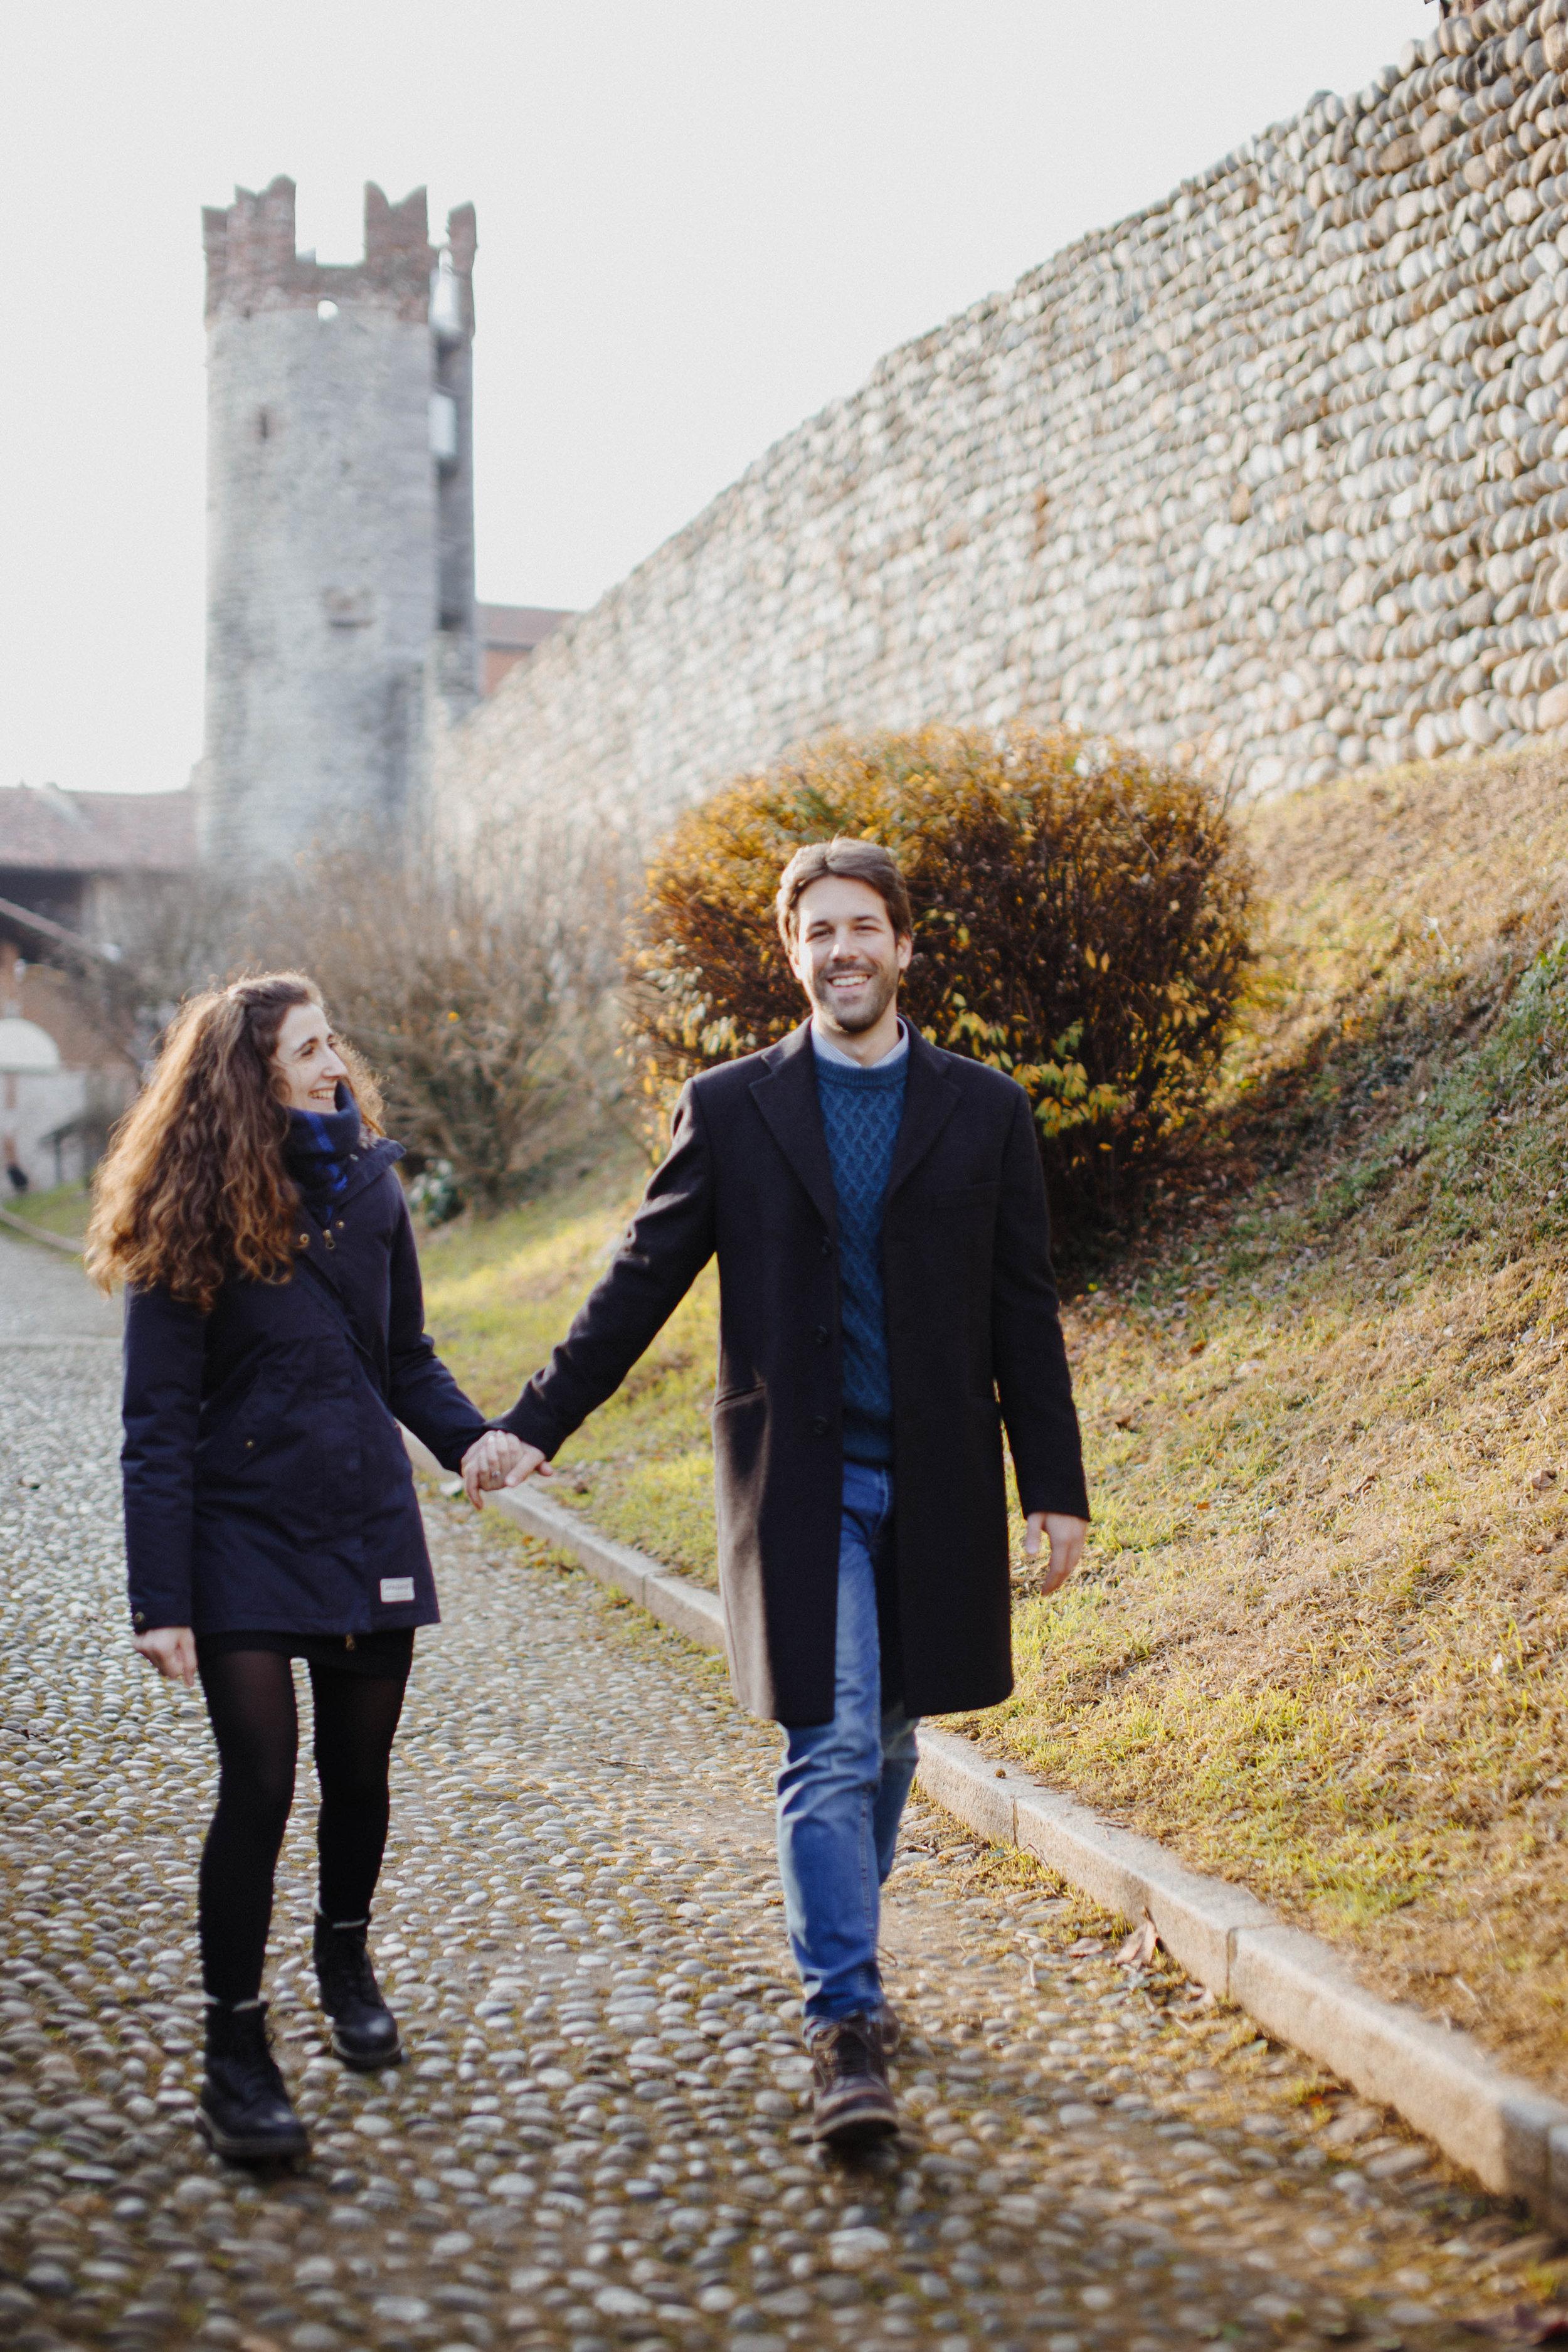 019 - Elisa + Riccardo - engagement.JPG